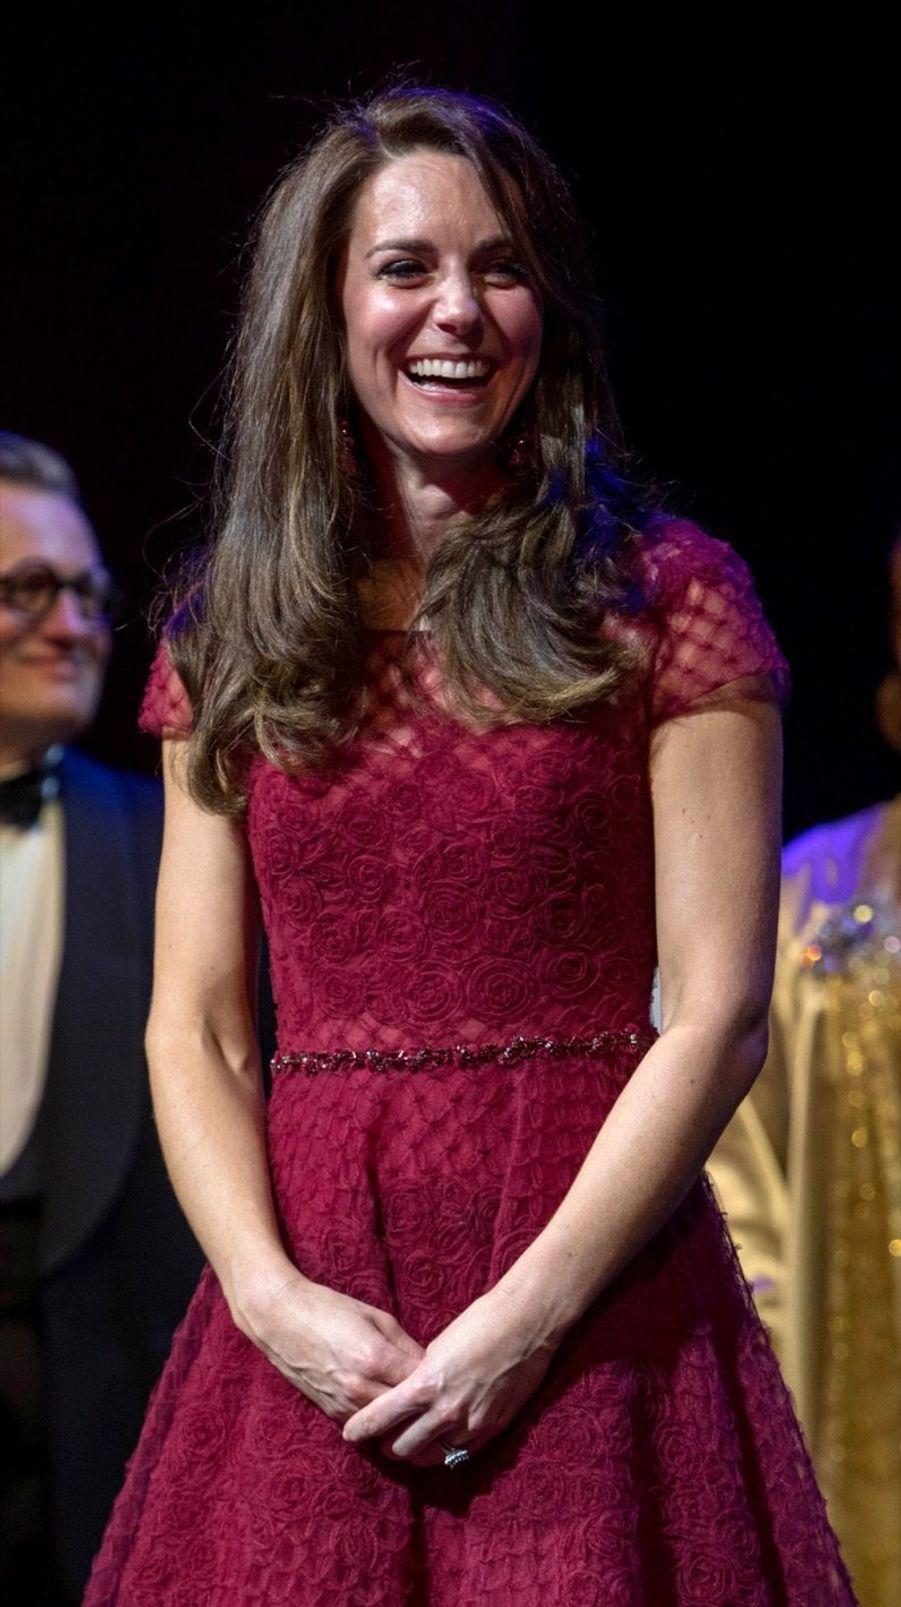 Kate Middleton Au Theatre Royal Drury Lane De Londres Mardi 4 Avril 2017 27